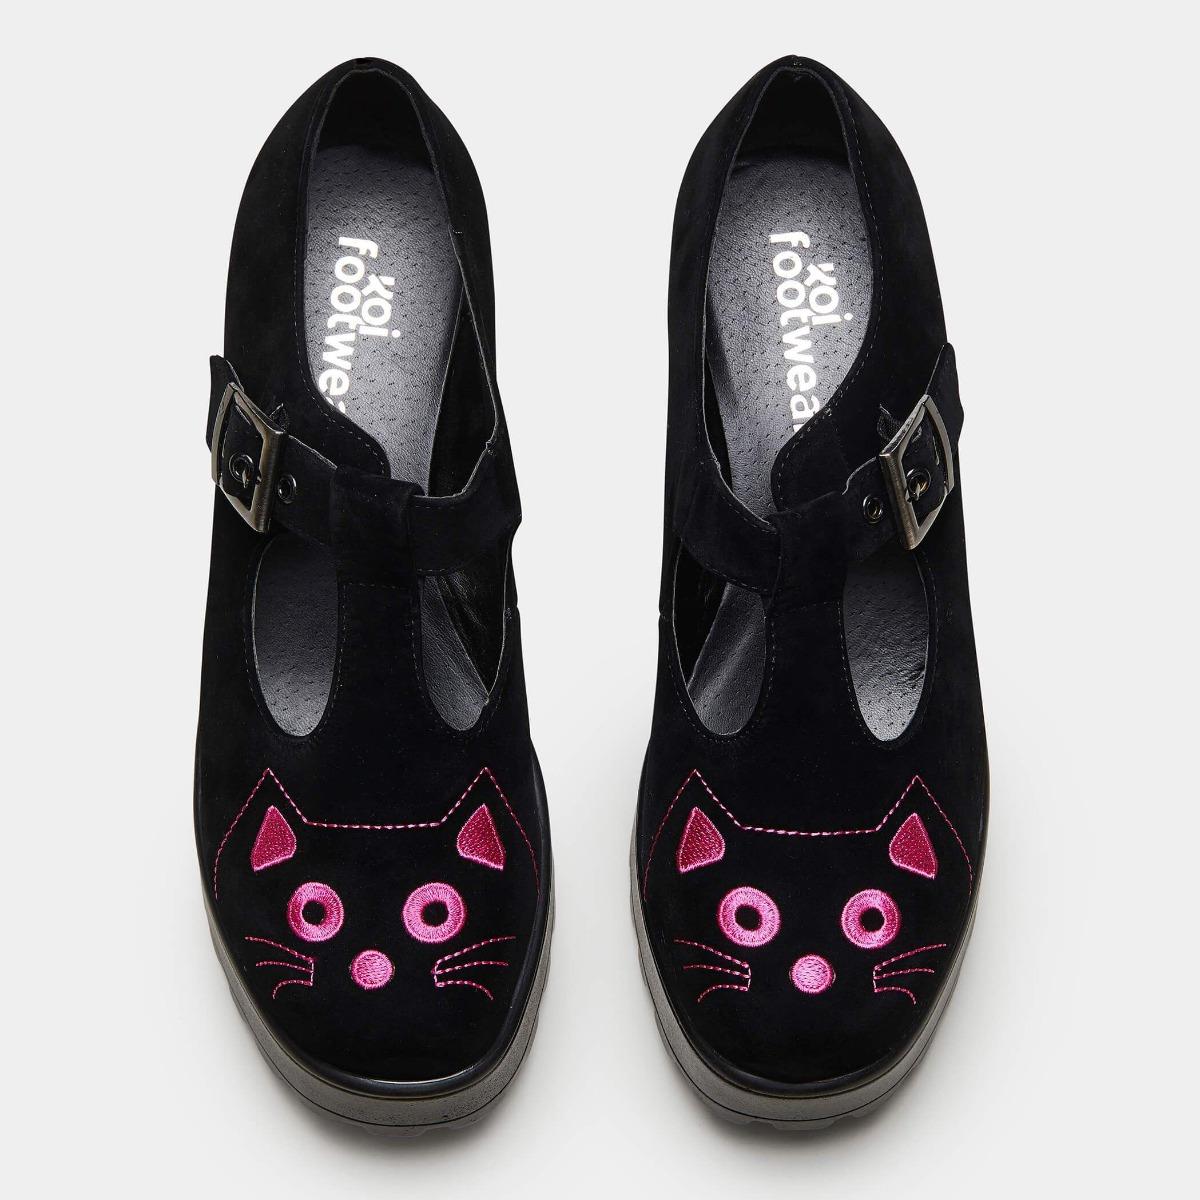 kfnd65pnk_chaussures-mary-jane-plateforme-gothique-glam-rock-fuji-cat